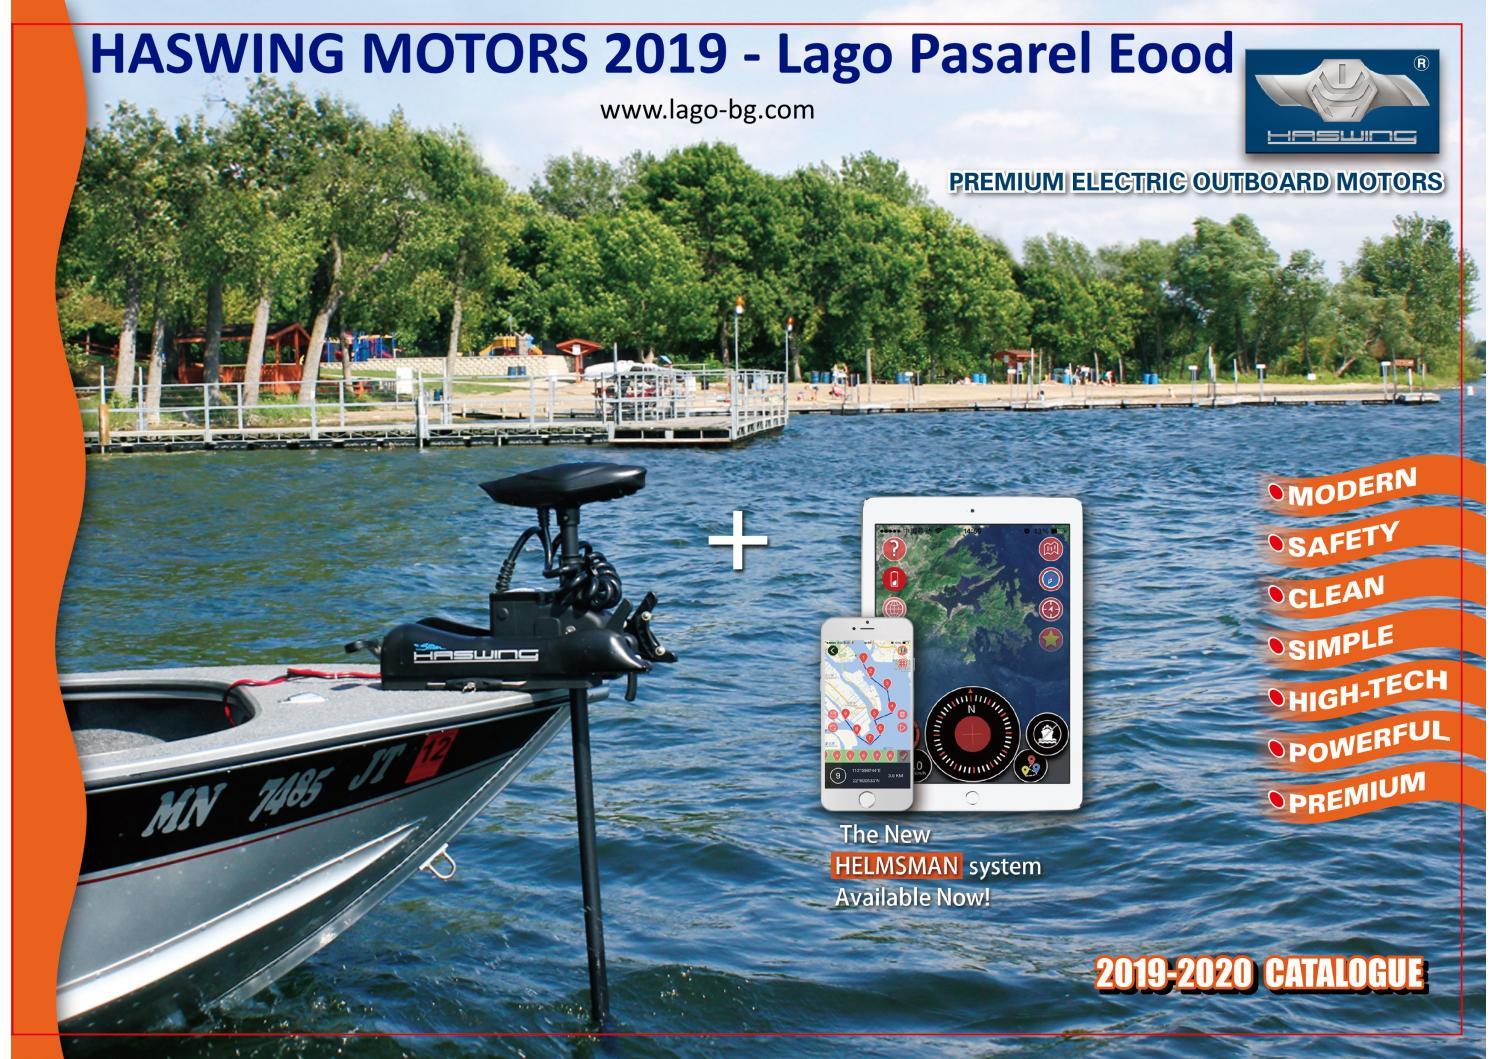 HASWING MOTORS 2019 by Lago Pasarel - issuu